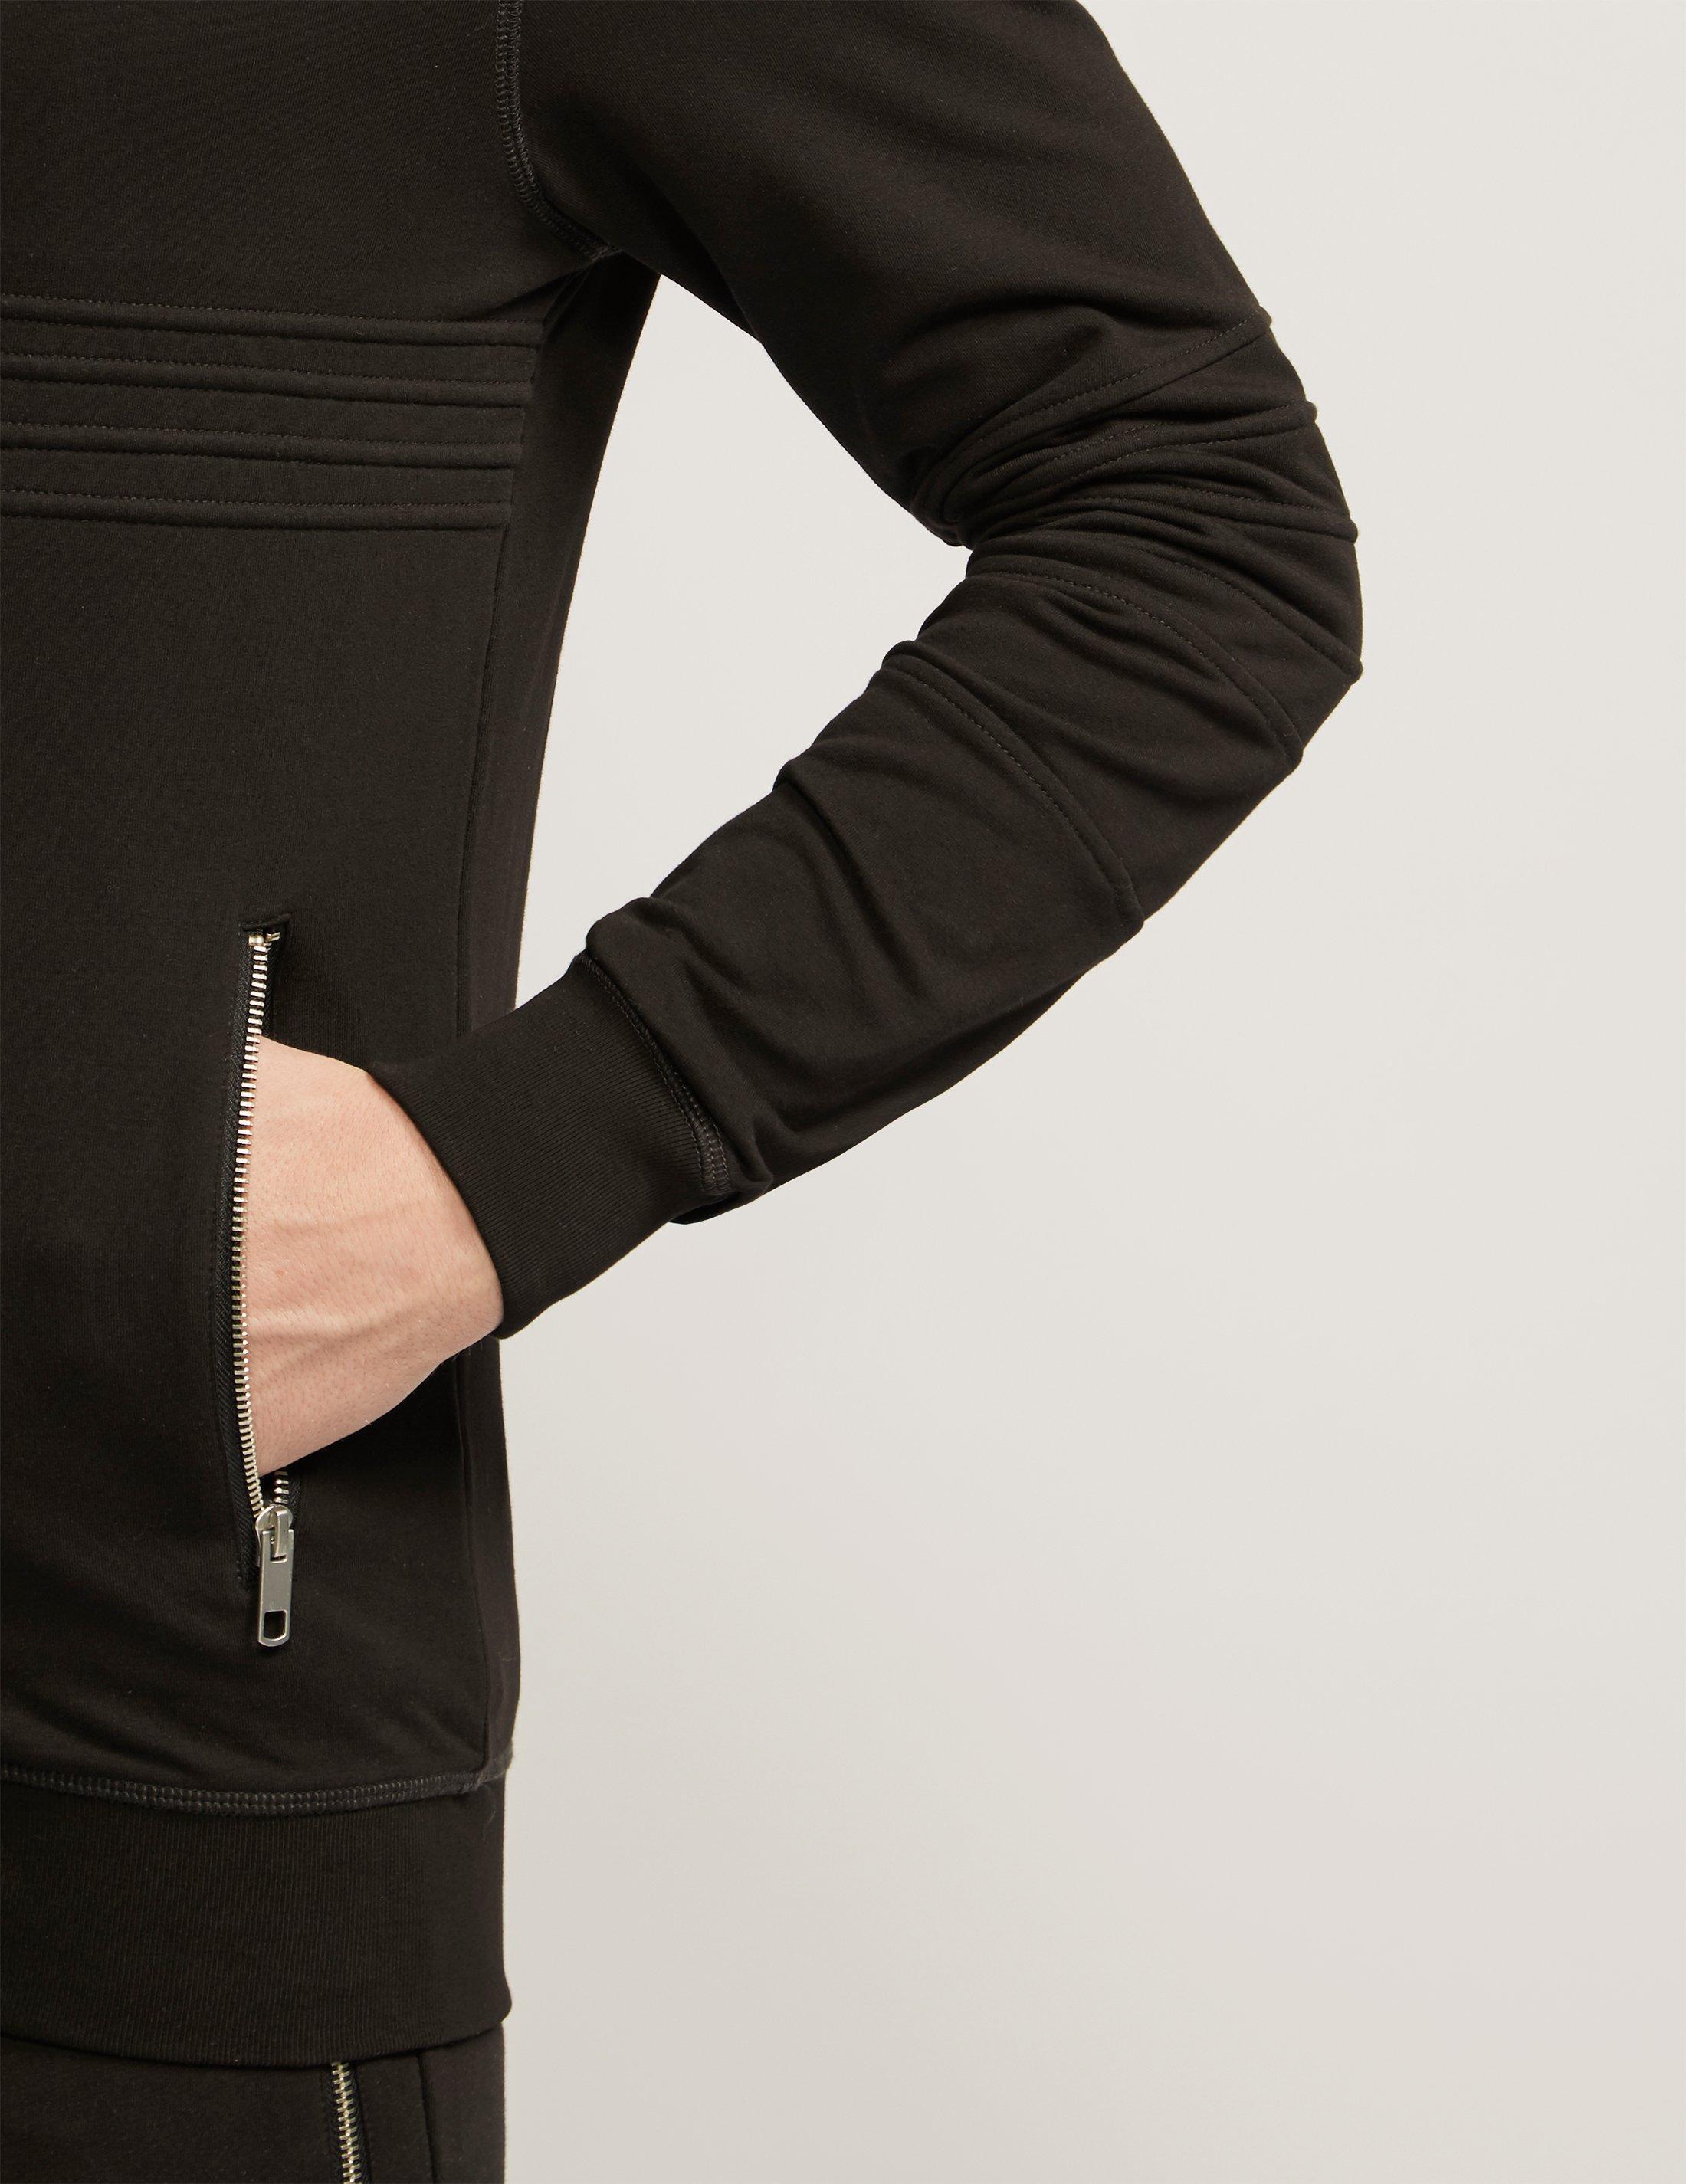 Antony Morato Fleece Hoody 2 in Black for Men